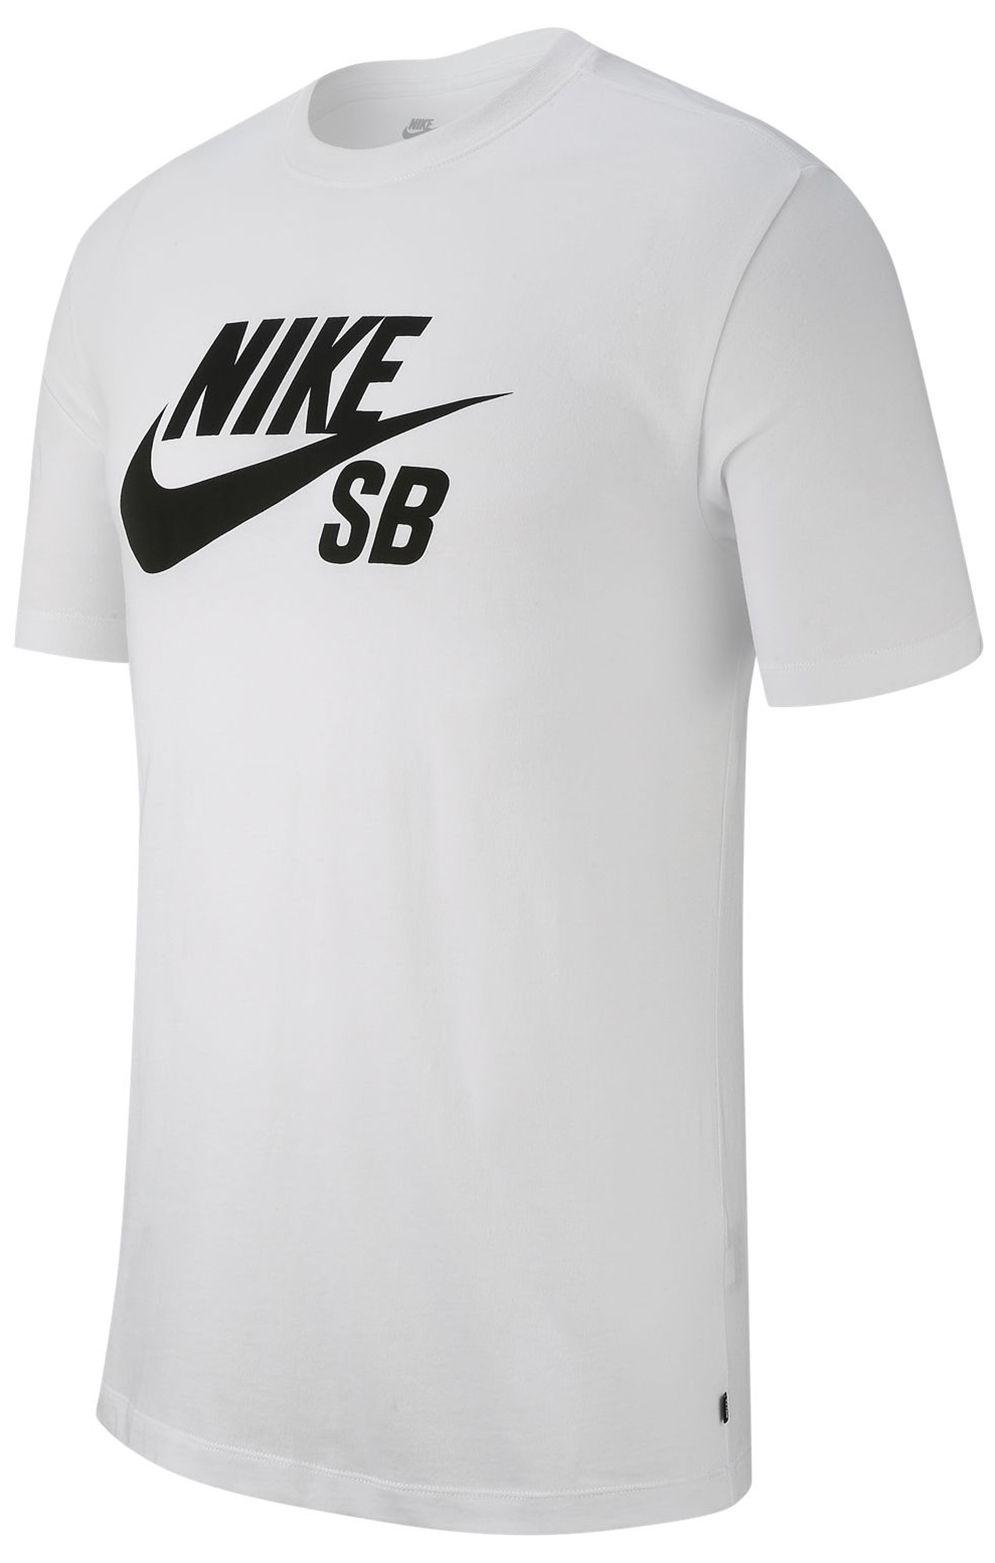 T-Shirt Nike Sb DRY DFCT LOGO White/(Black)